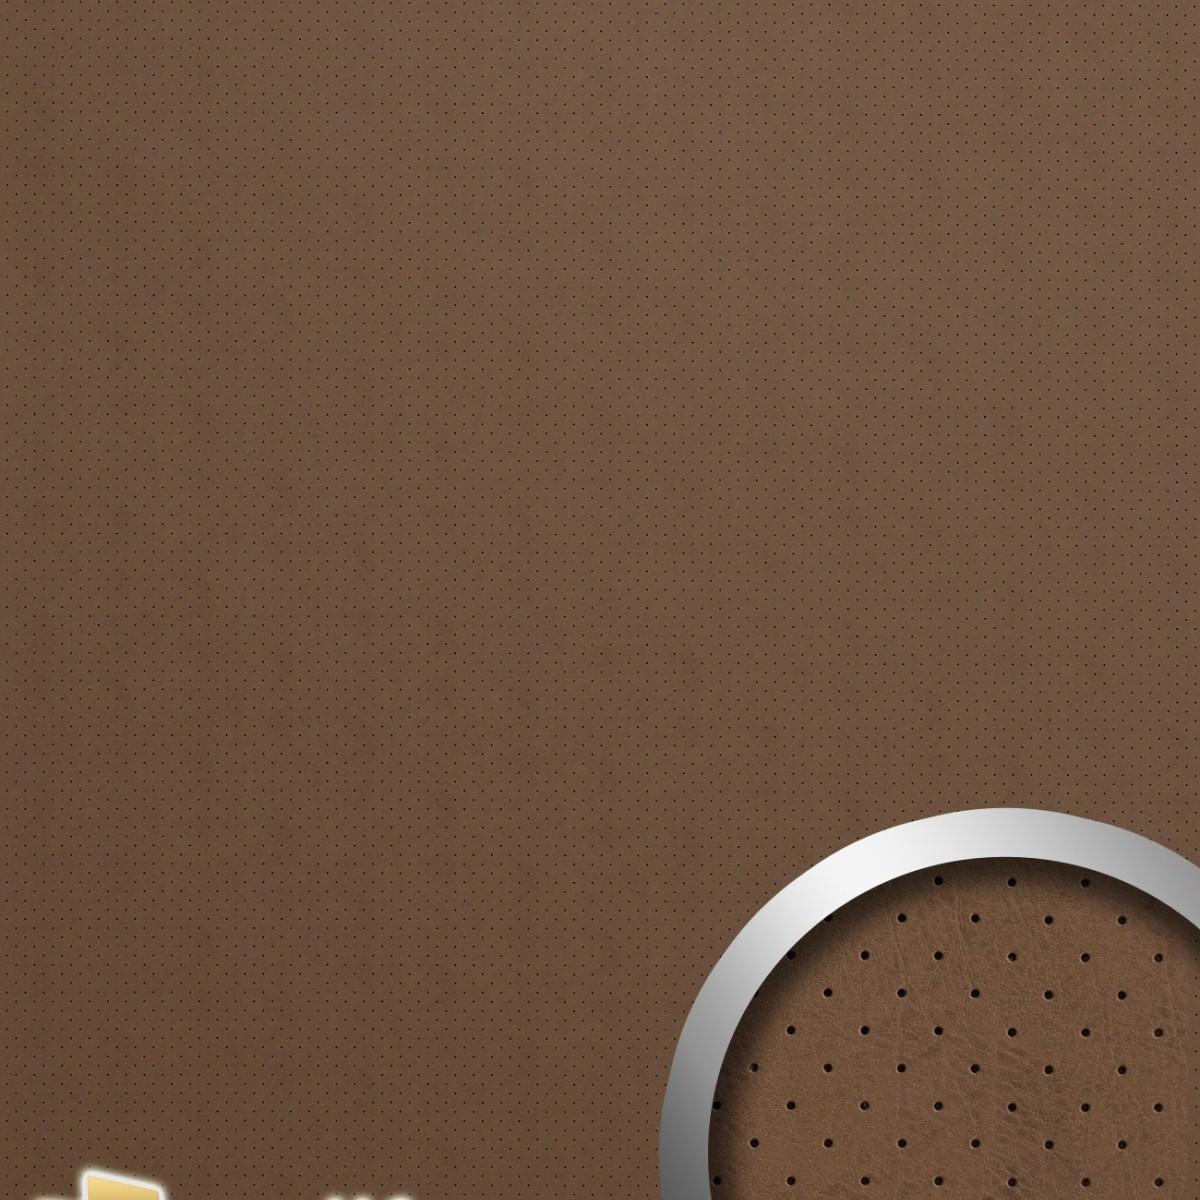 Panou decorativ LEATHER 15286, WallFace, autocolant